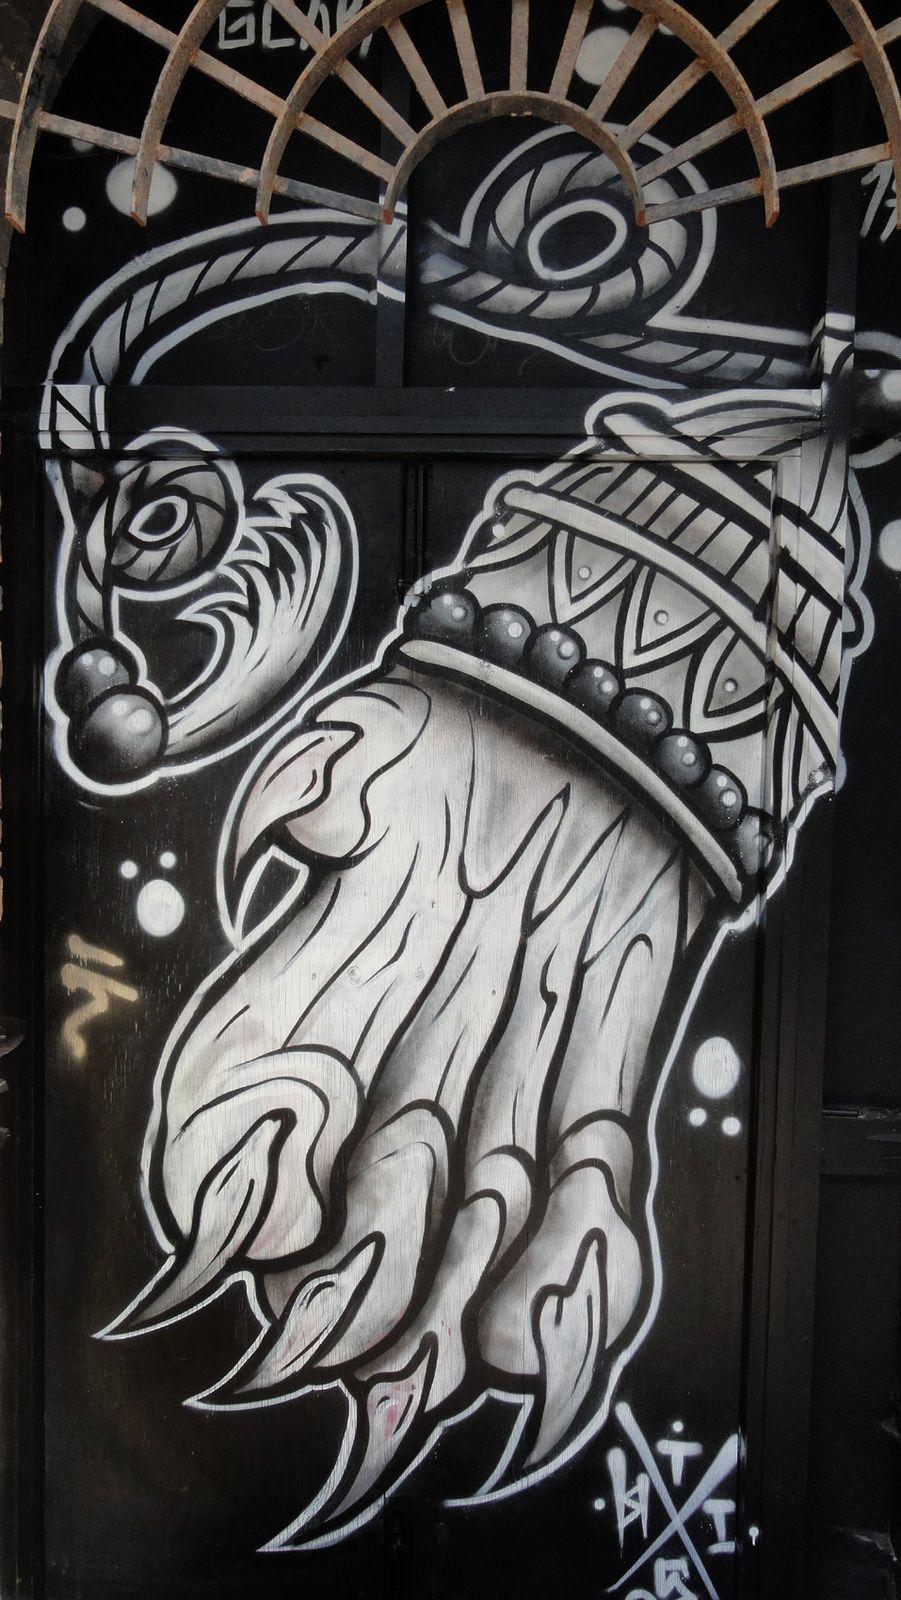 Street Art : Graffitis &amp&#x3B; Fresques Murales District Spitalfields East End of London